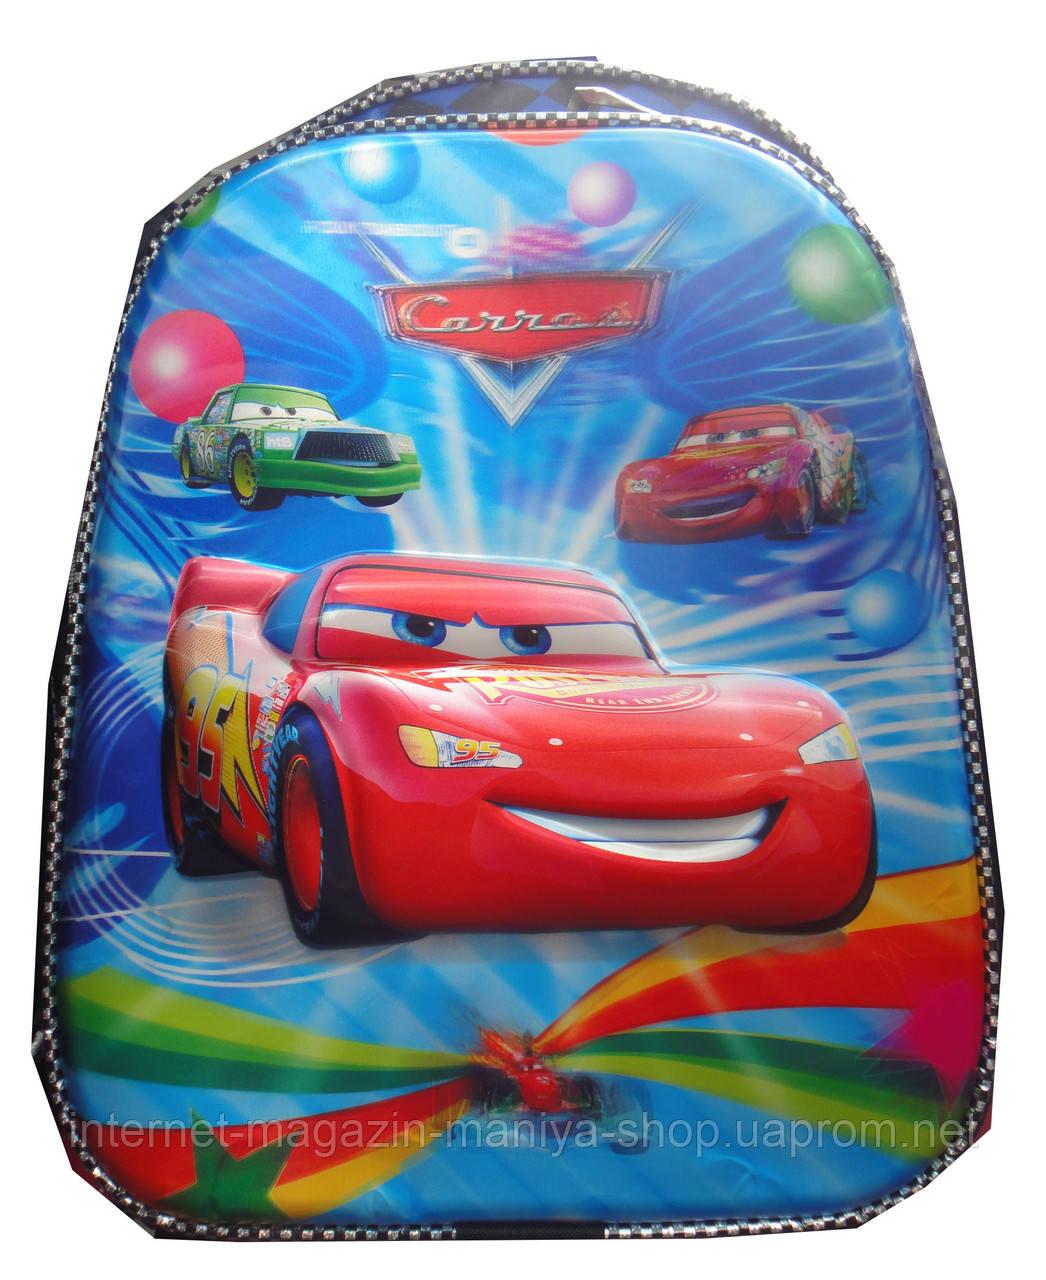 Рюкзак для мальчика тачки школа